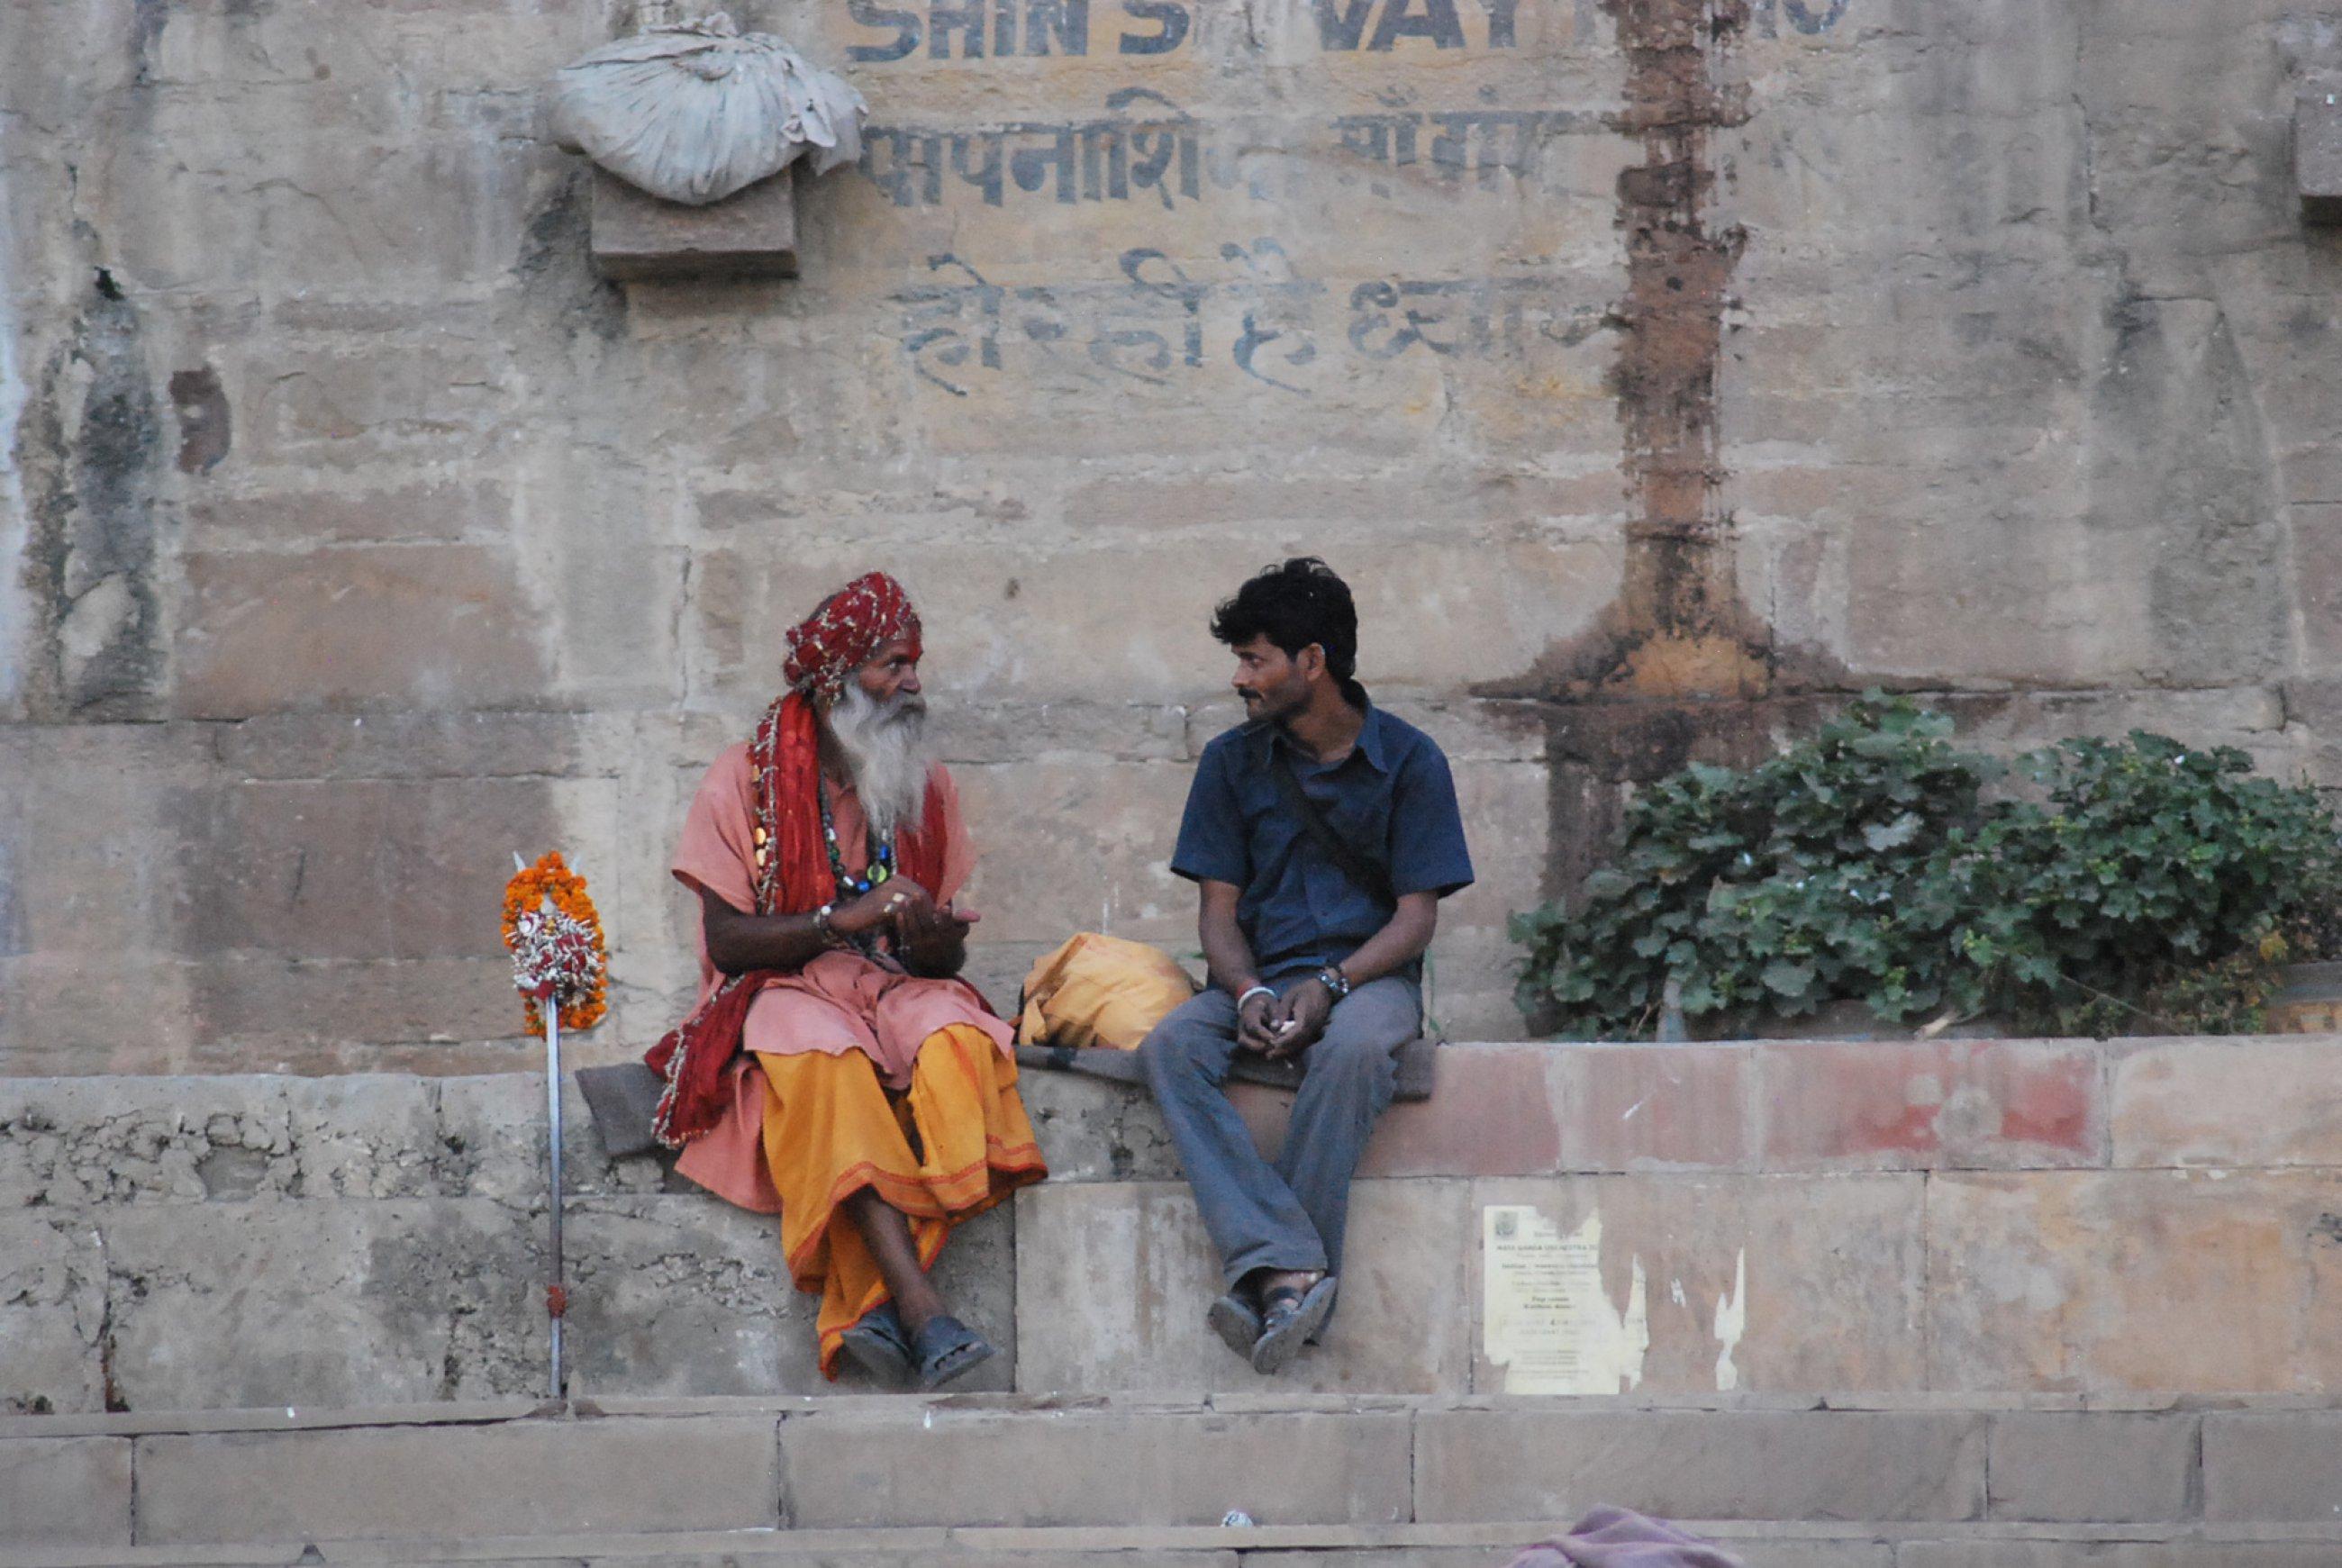 https://bubo.sk/uploads/galleries/3467/india-varanasi-dsc-6580.jpg